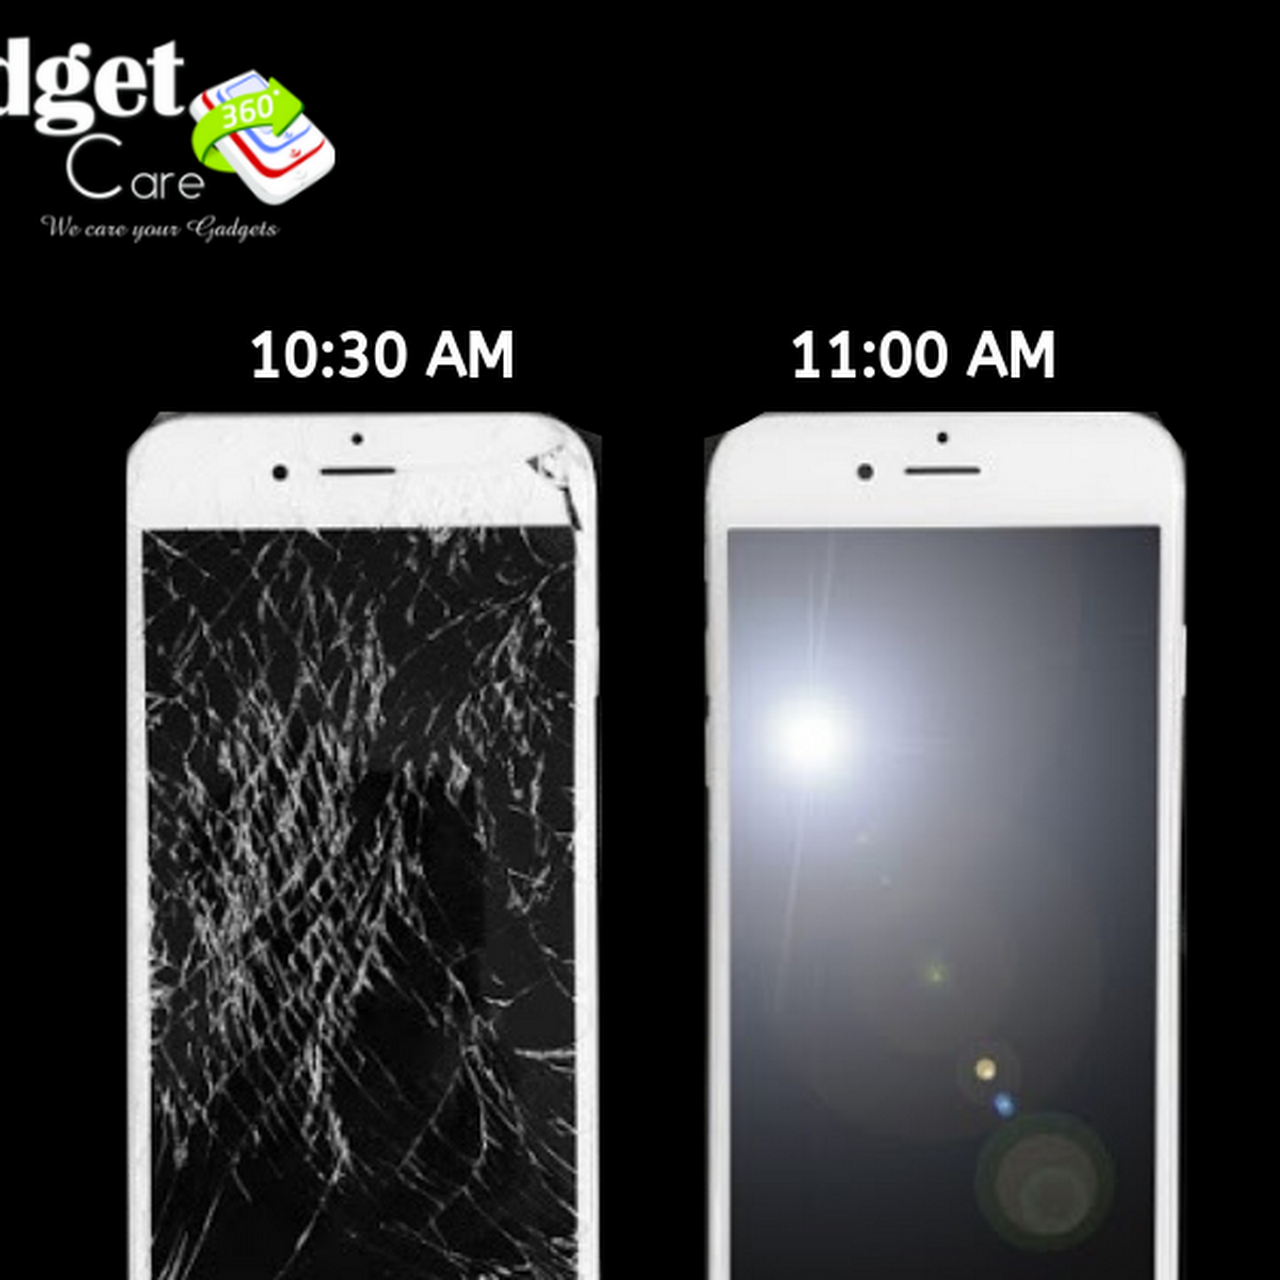 iPhone Service Center (Gadget Care 360°) - #1 Mobile Phone